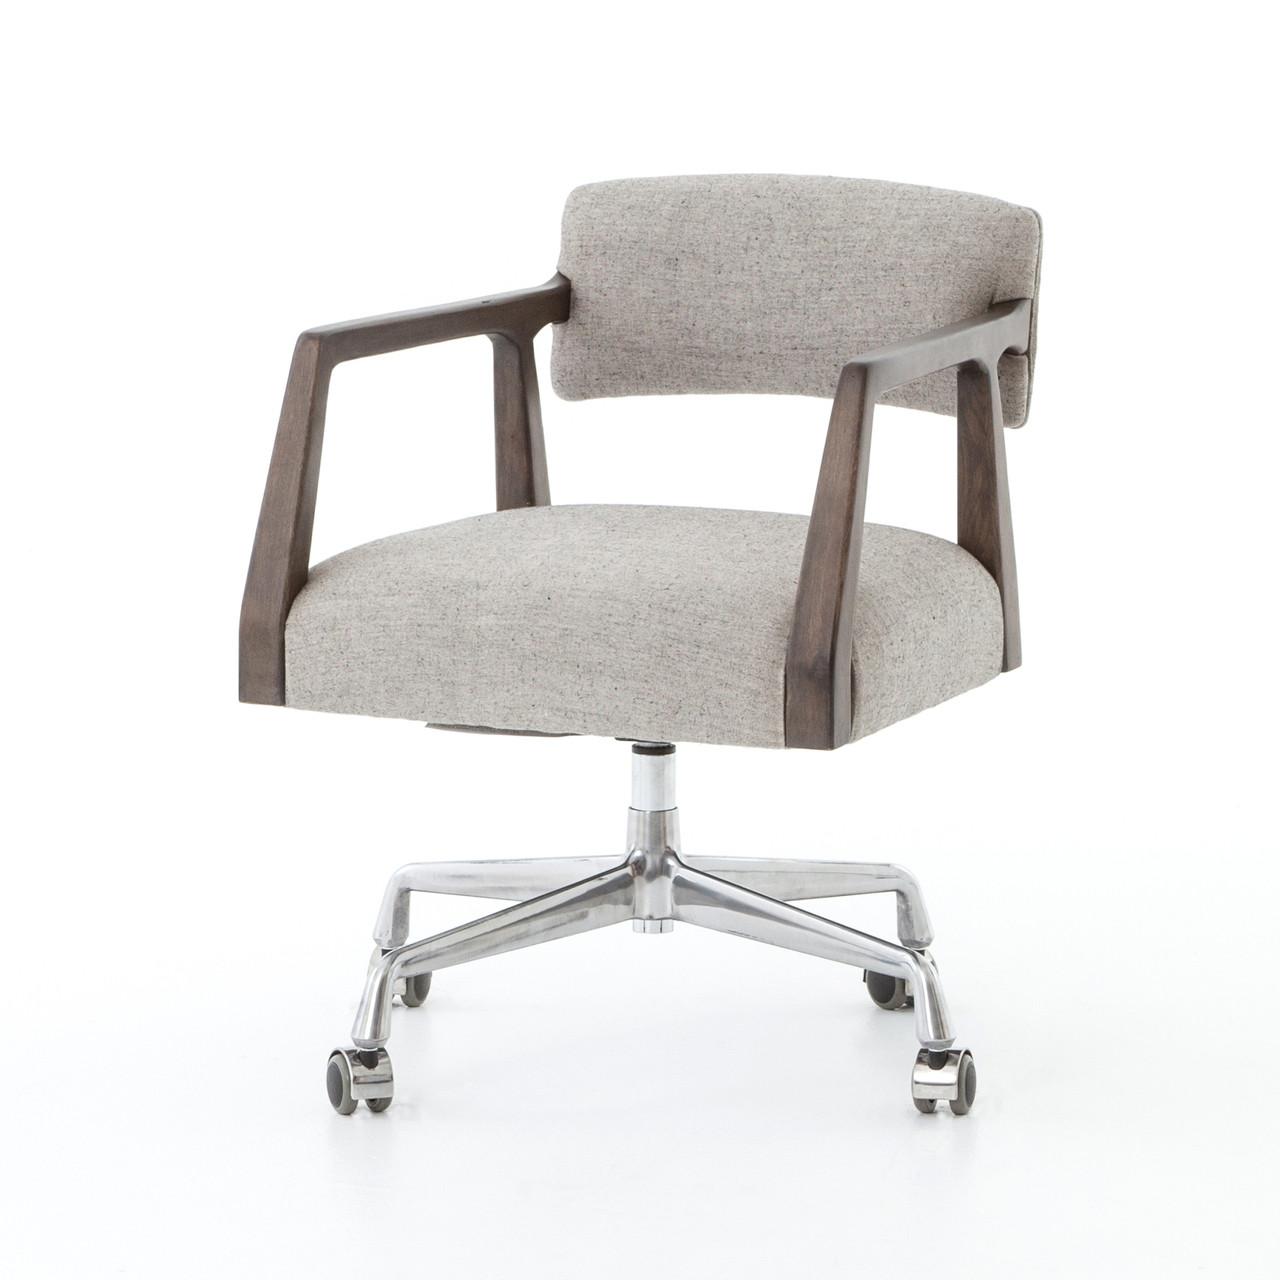 Peachy Tyler Mid Century Modern Upholstered Office Desk Chair Download Free Architecture Designs Intelgarnamadebymaigaardcom